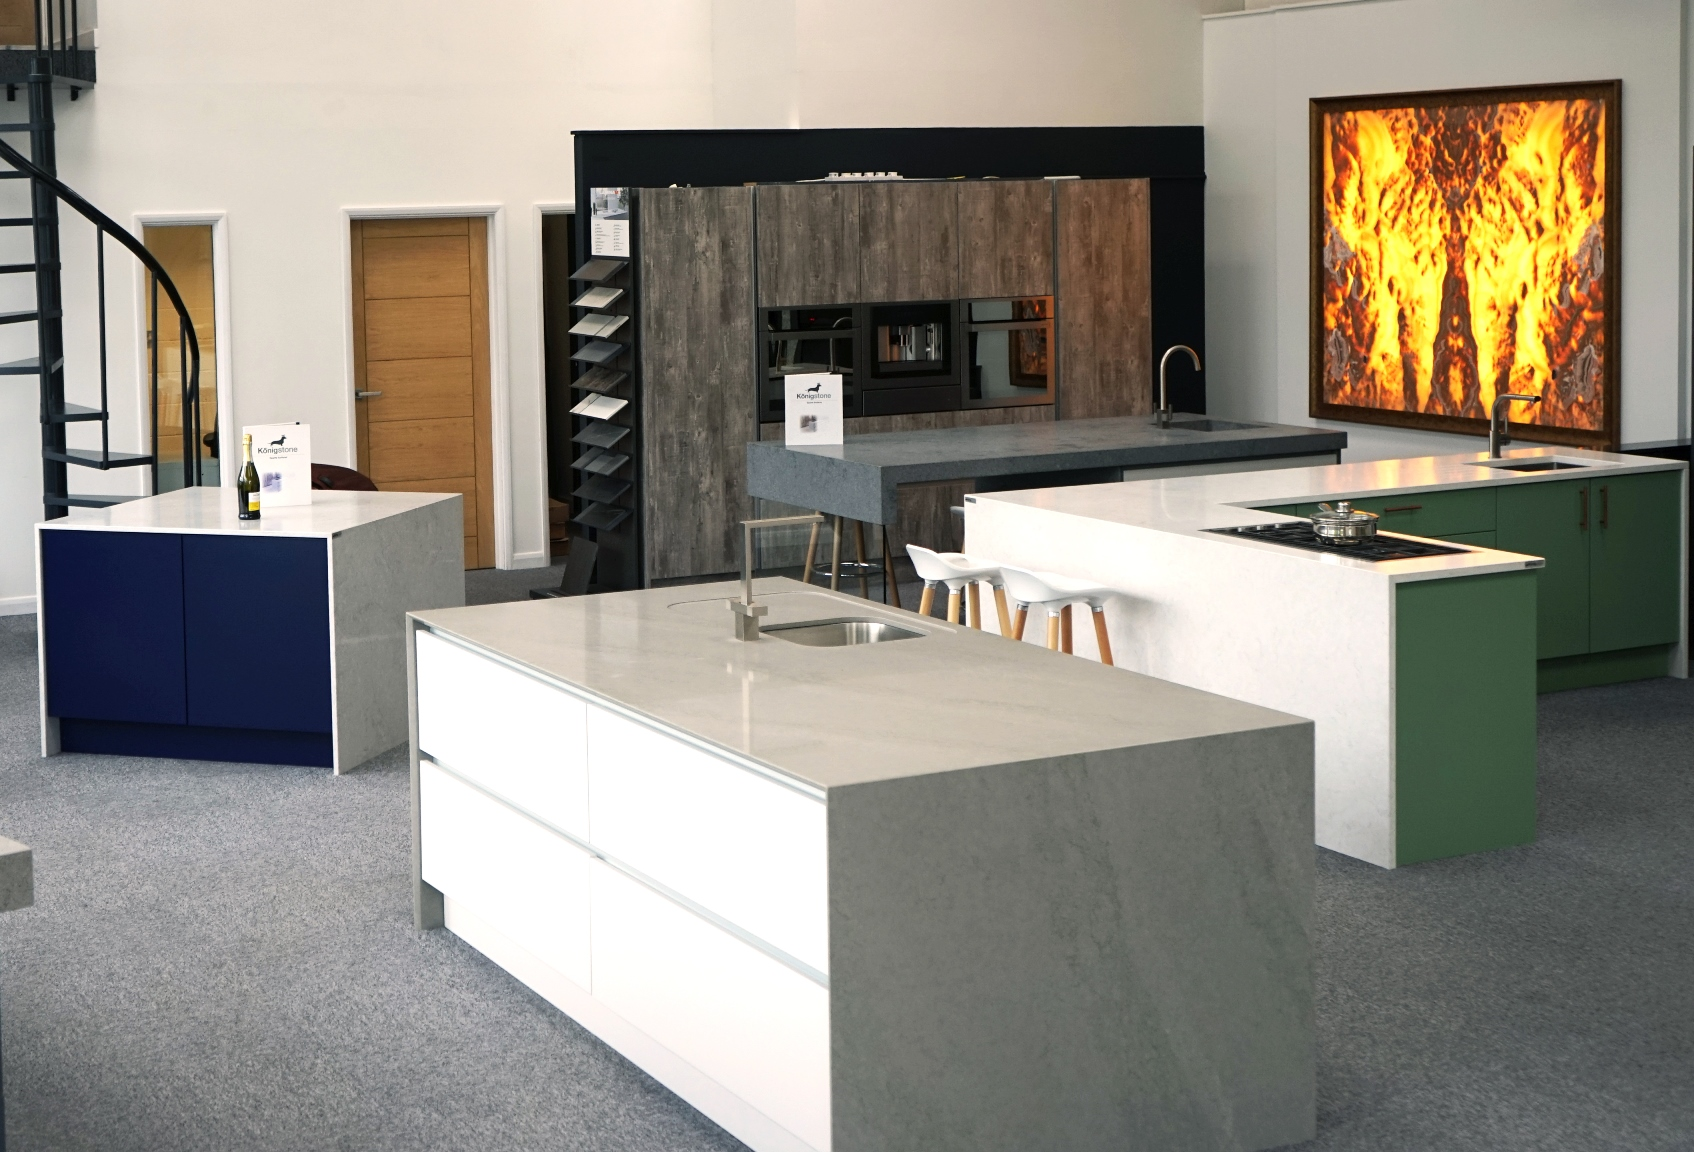 Stunning Königstone showroom – a feast of high-end worktops